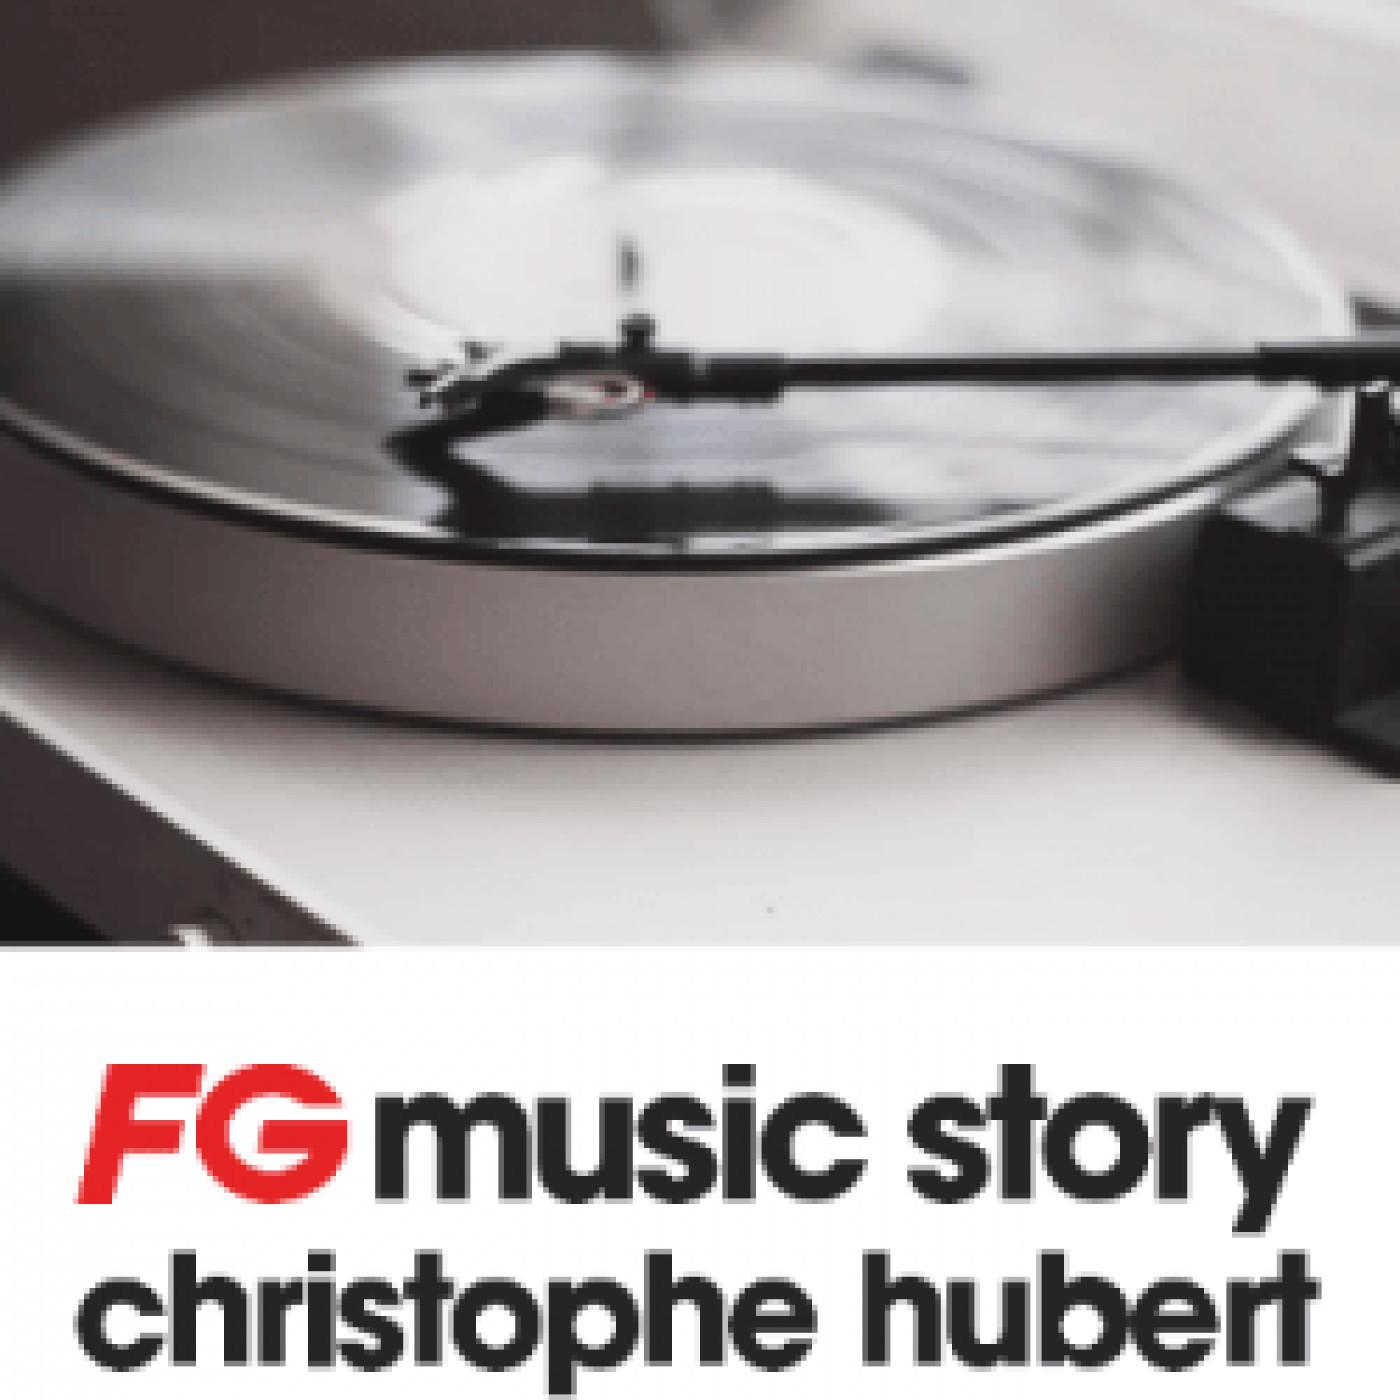 FG MUSIC STORY : DAVID GUETTA